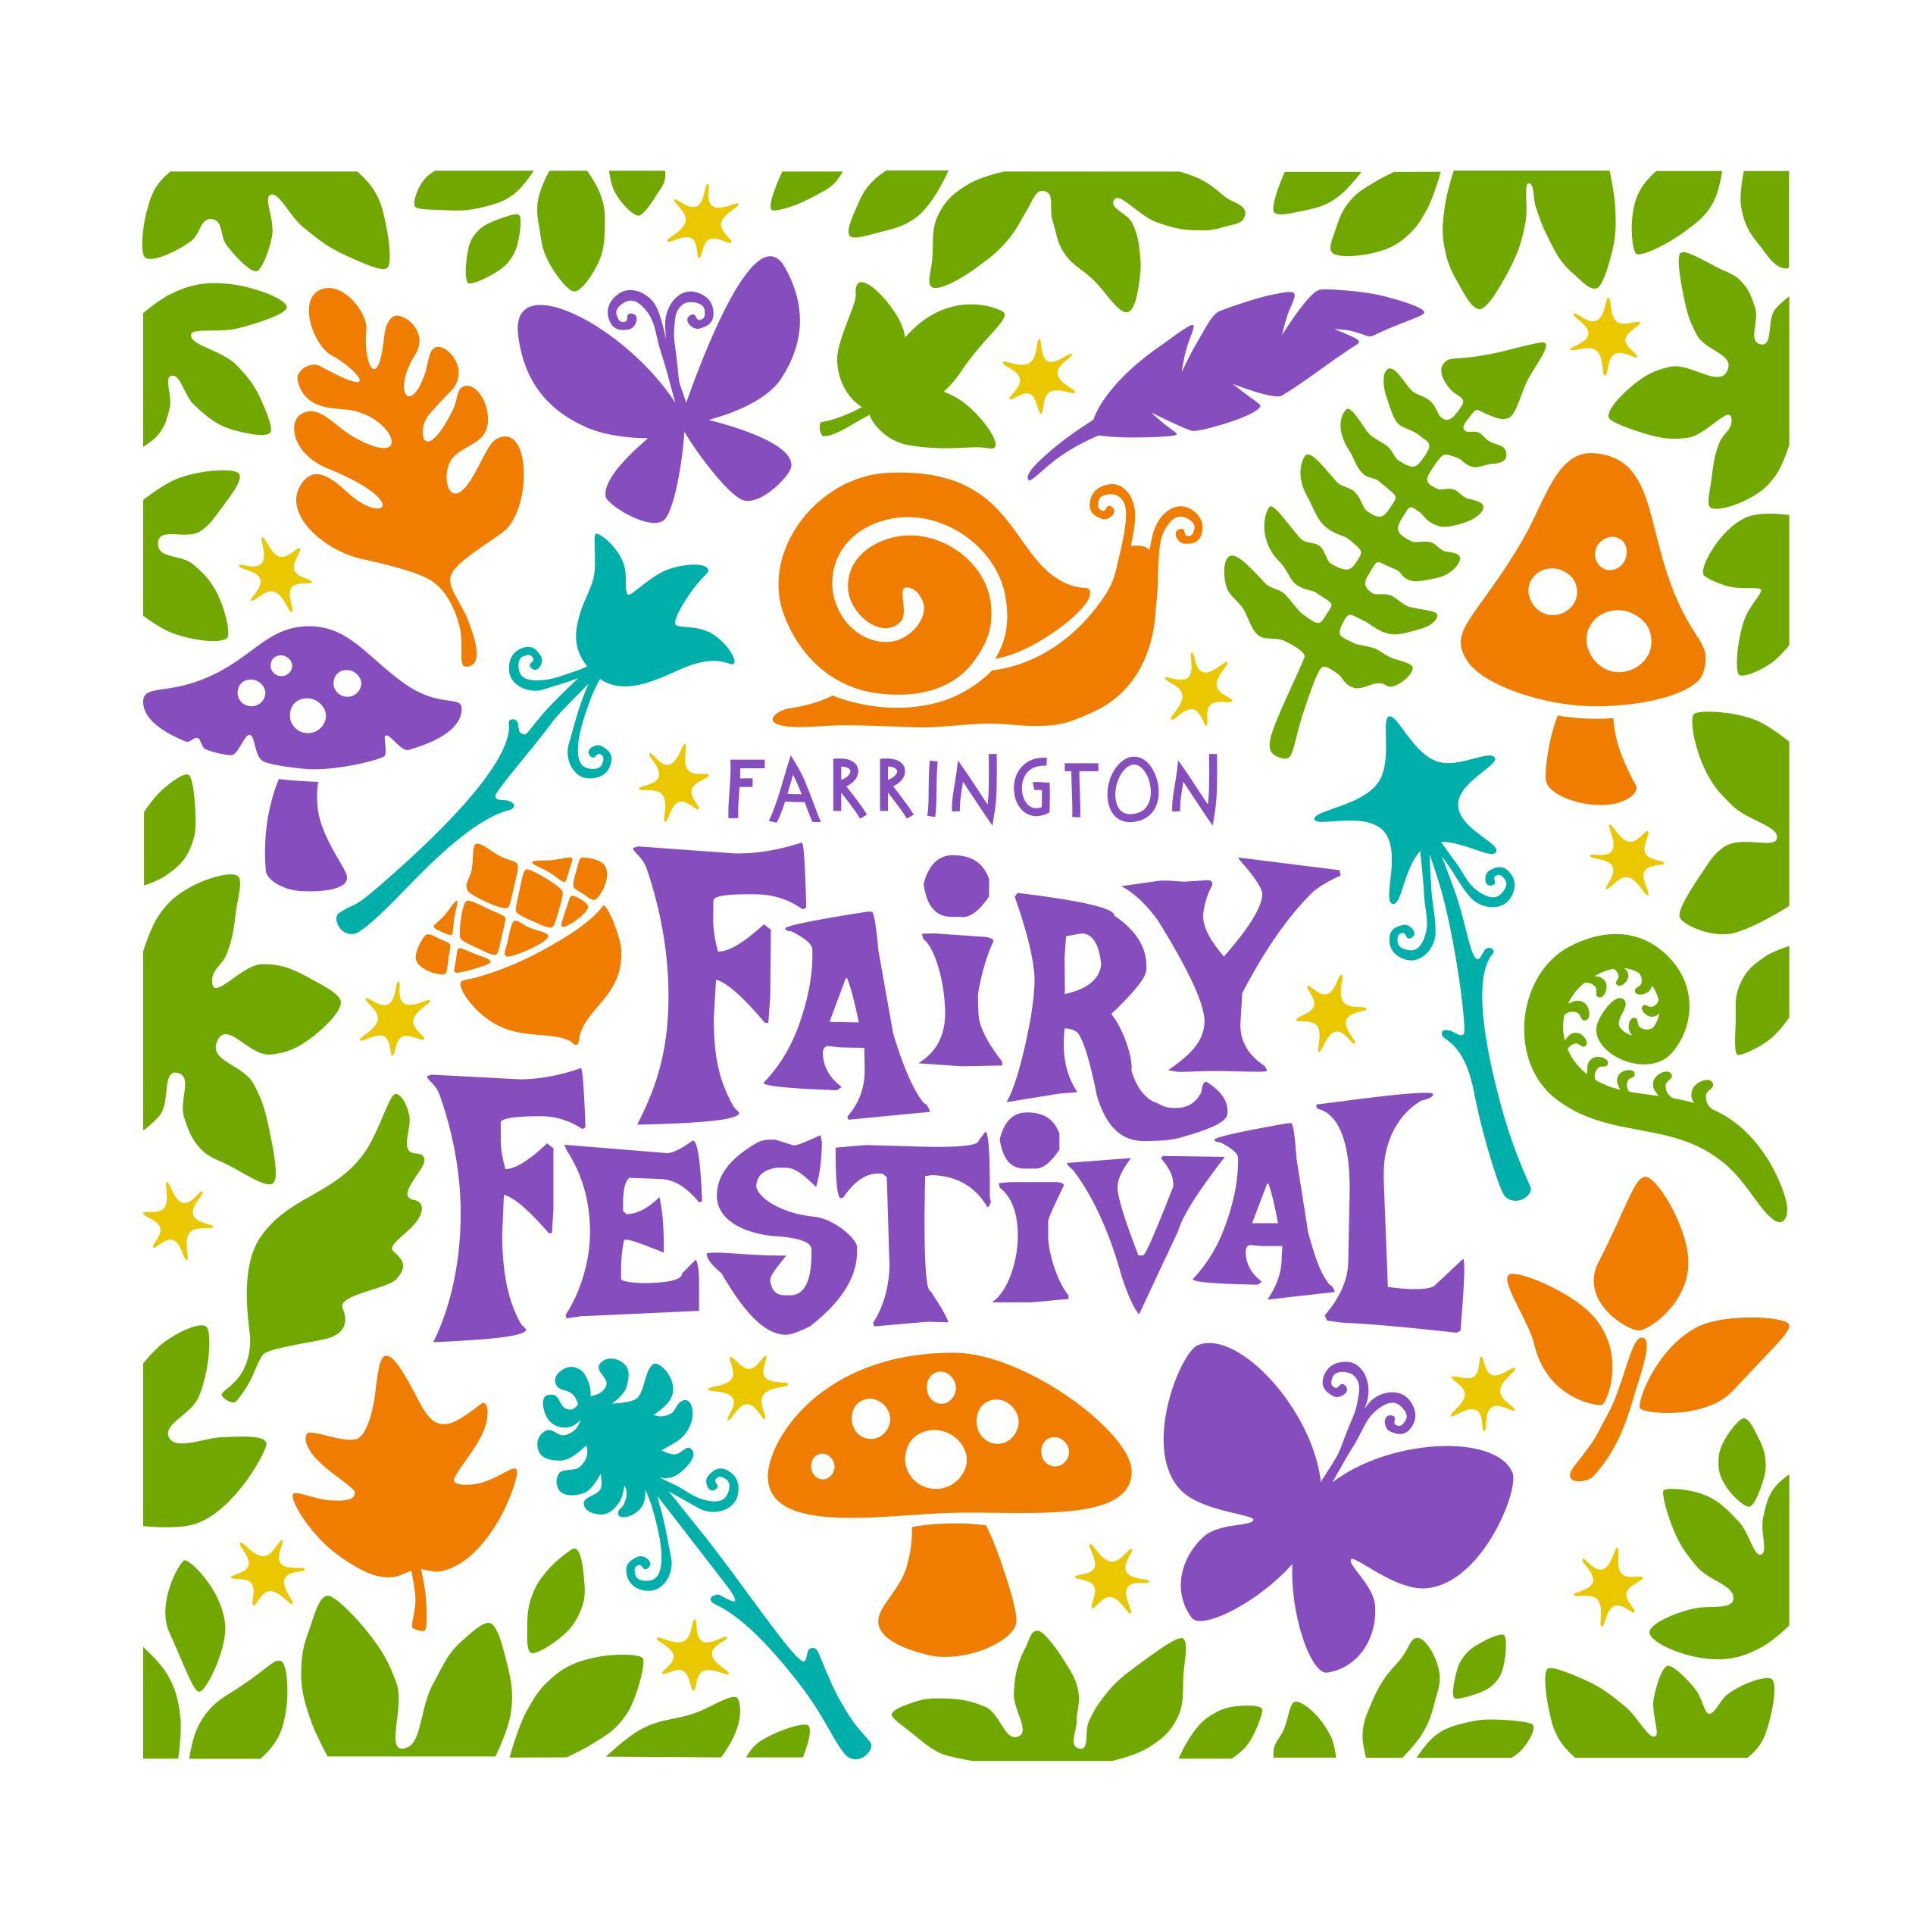 Farrington Fairy Festival, Lincoln, MA.